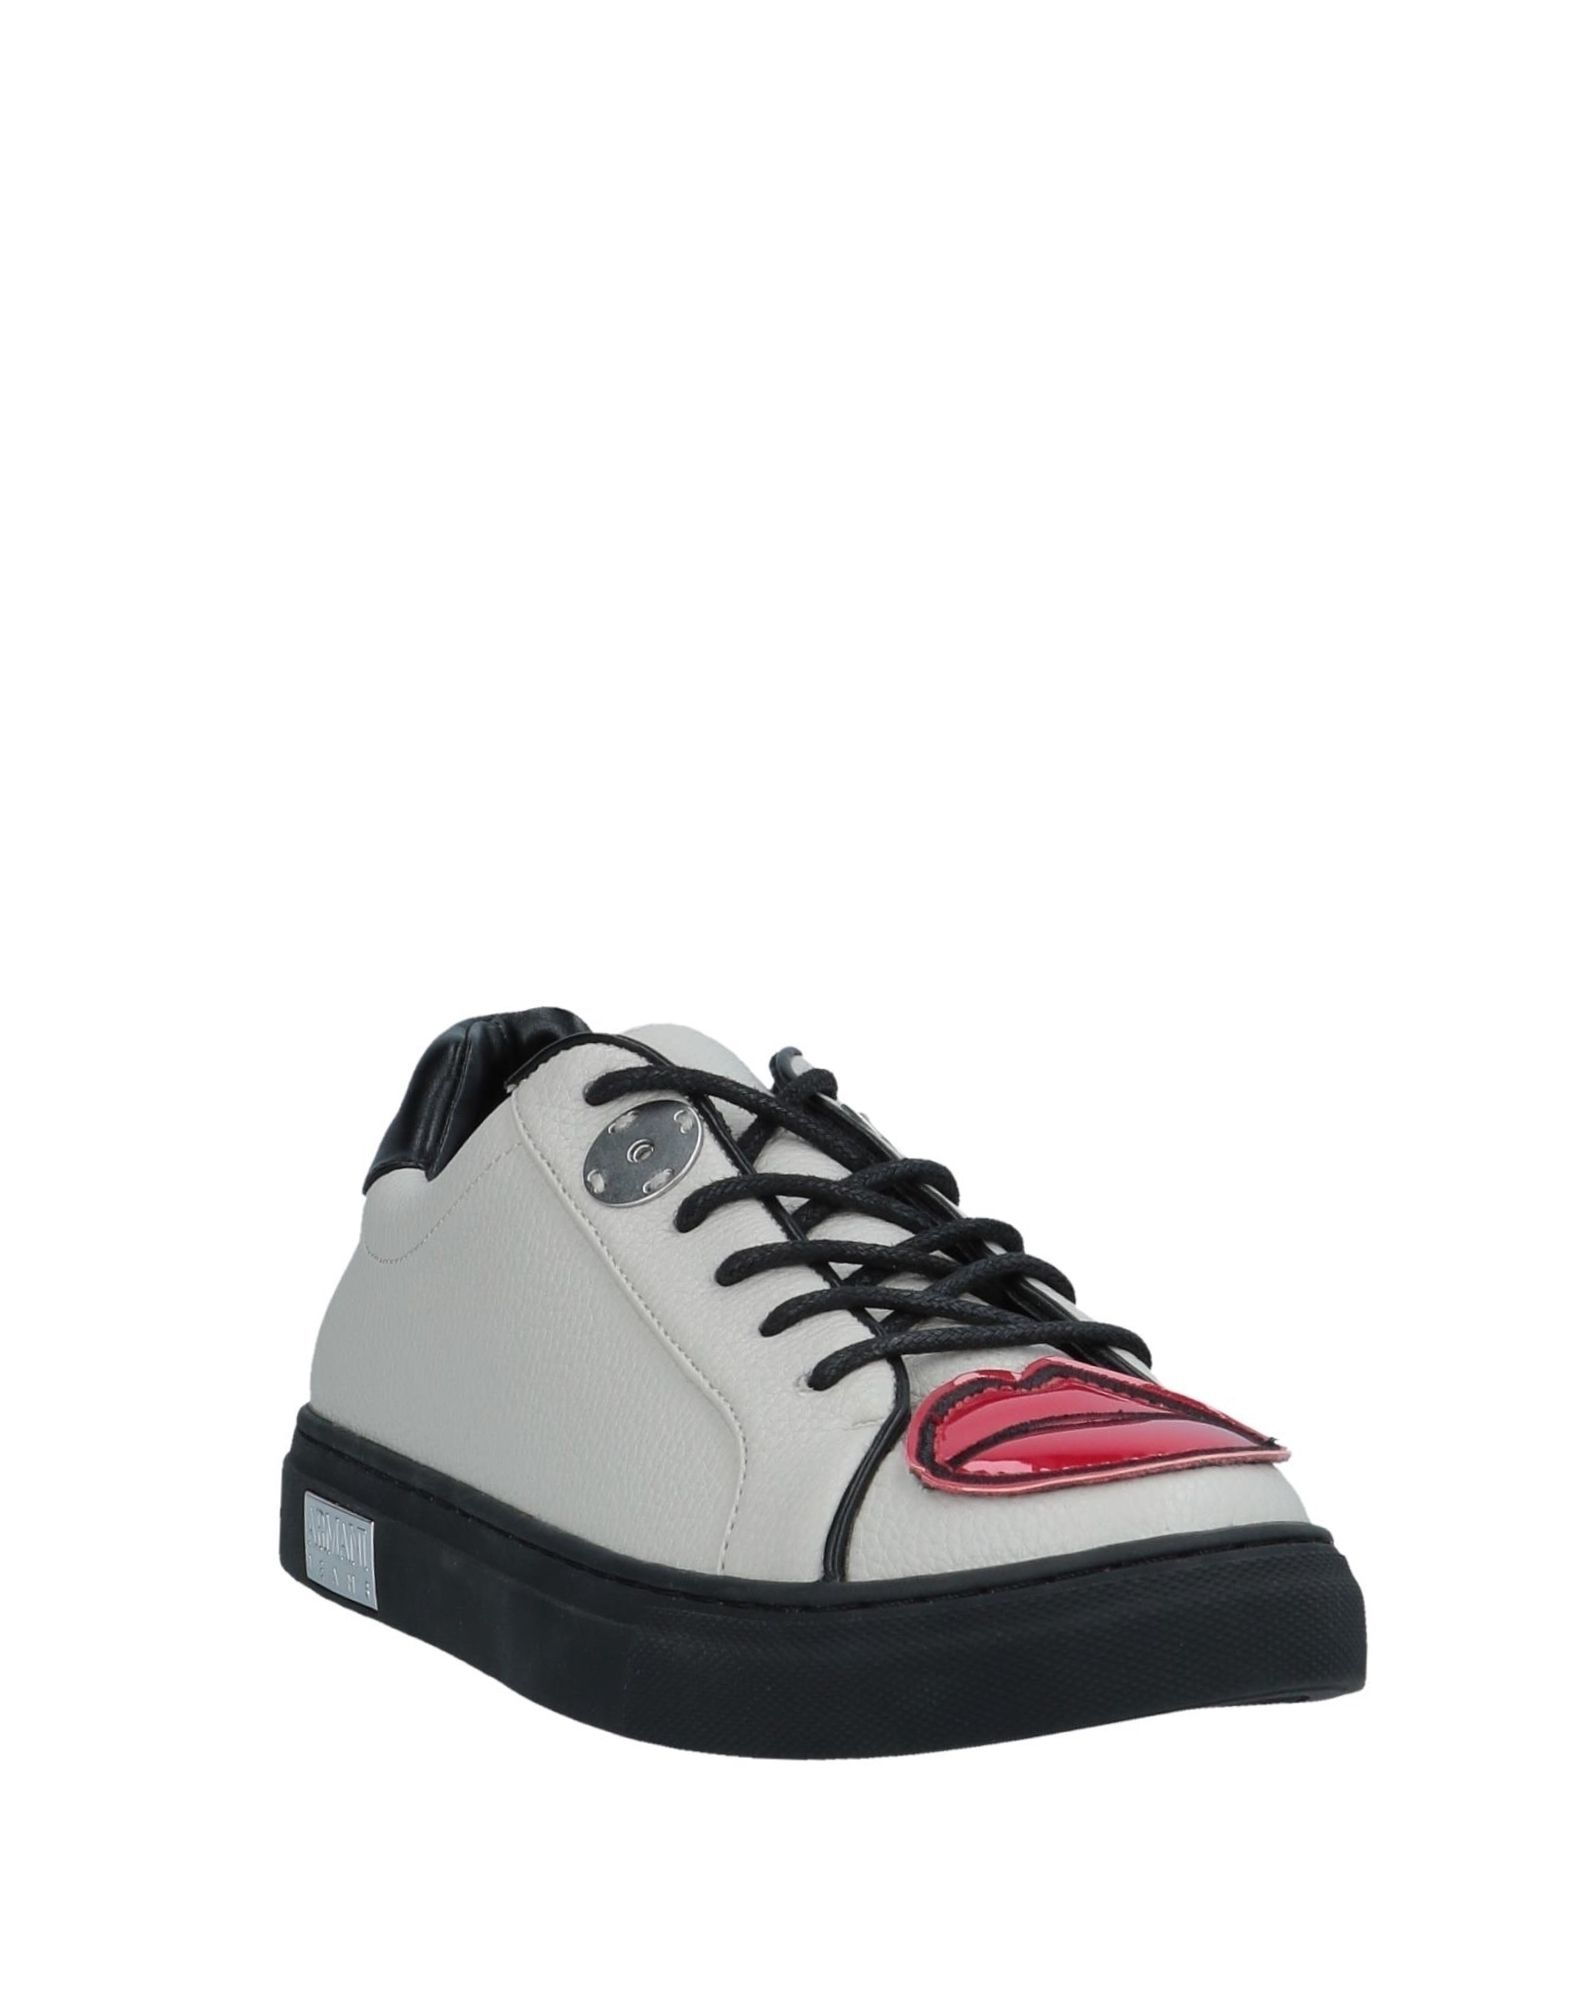 2f0683121b ARMANI JEANS ΠΑΠΟΥΤΣΙΑ Παπούτσια τένις χαμηλά